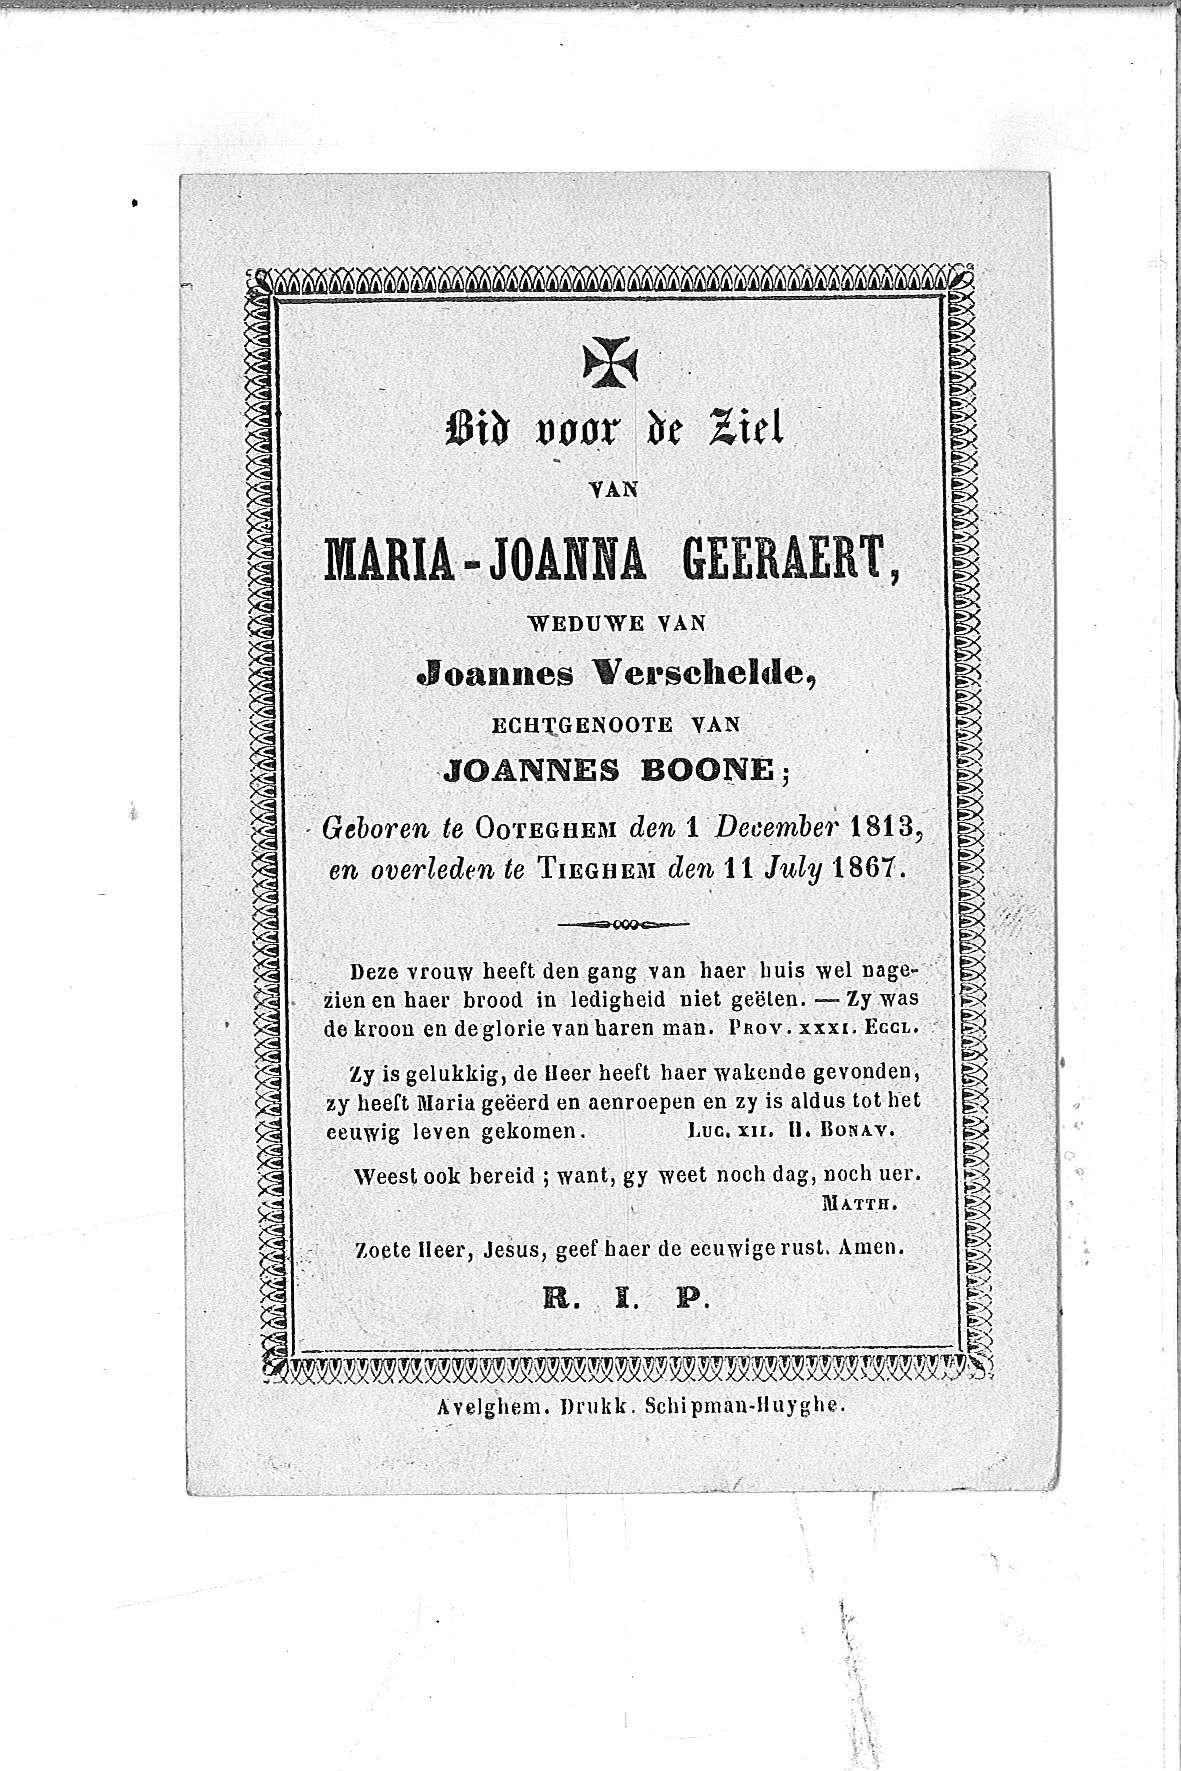 Maria-Joanna(1867)20130819160133_00012.jpg